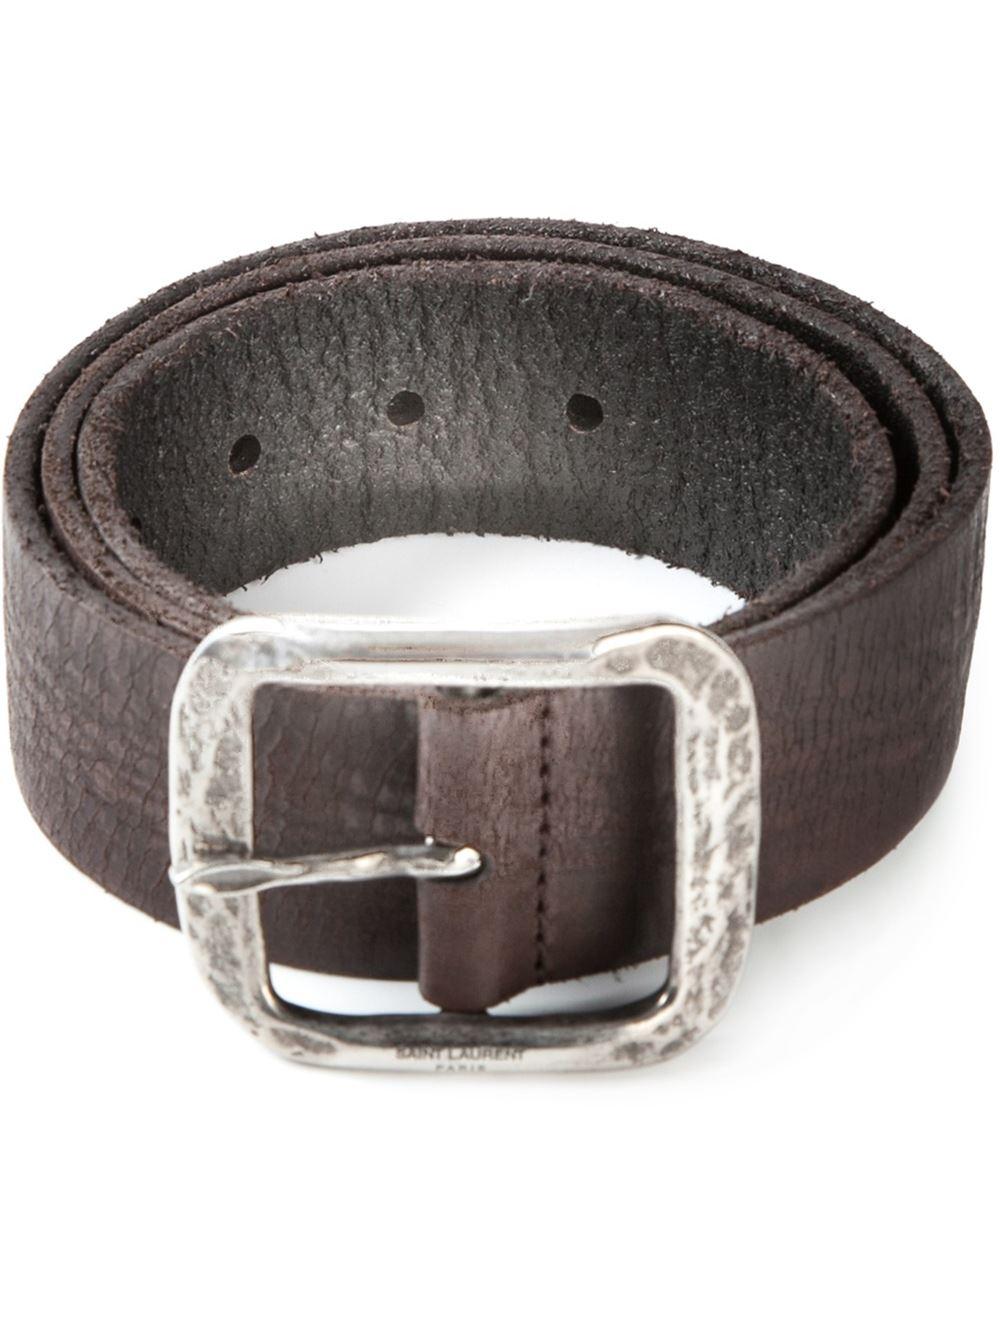 embossed belt - Brown Saint Laurent dRYi22aU5